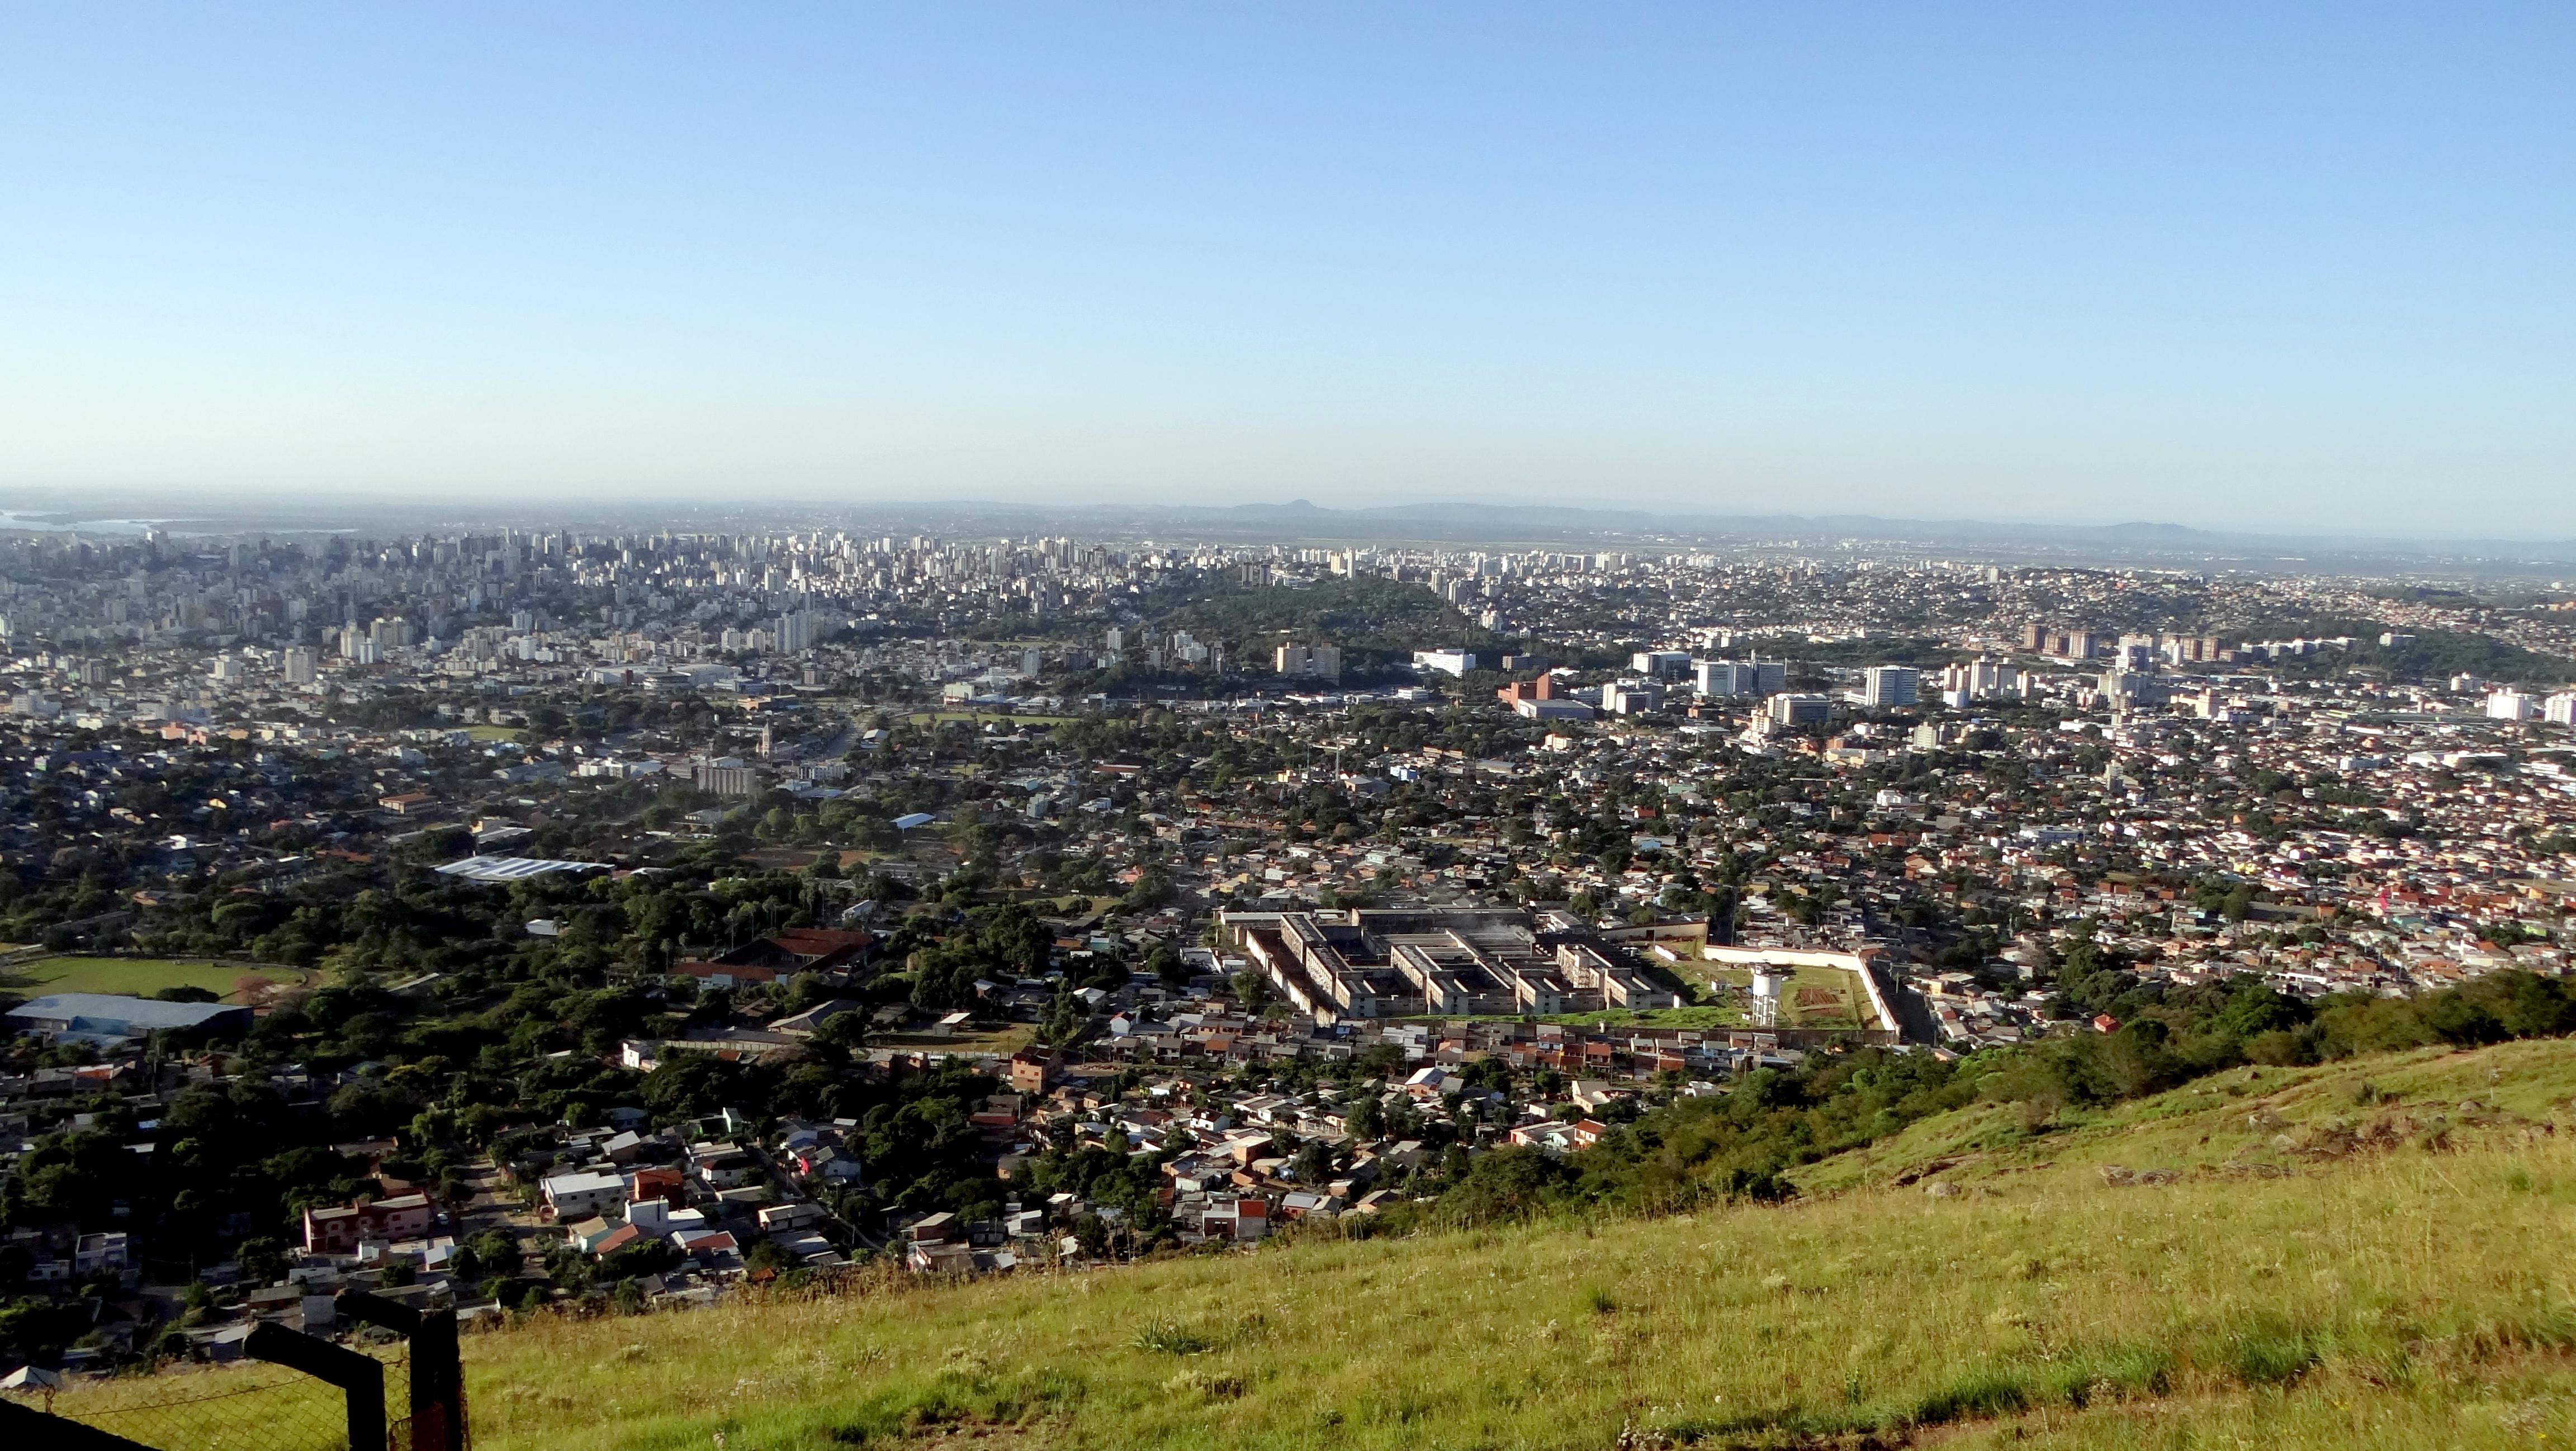 Armario Capsula Feminino ~ Porto Alegre vista do alto do Morro da Policia by ohnidan